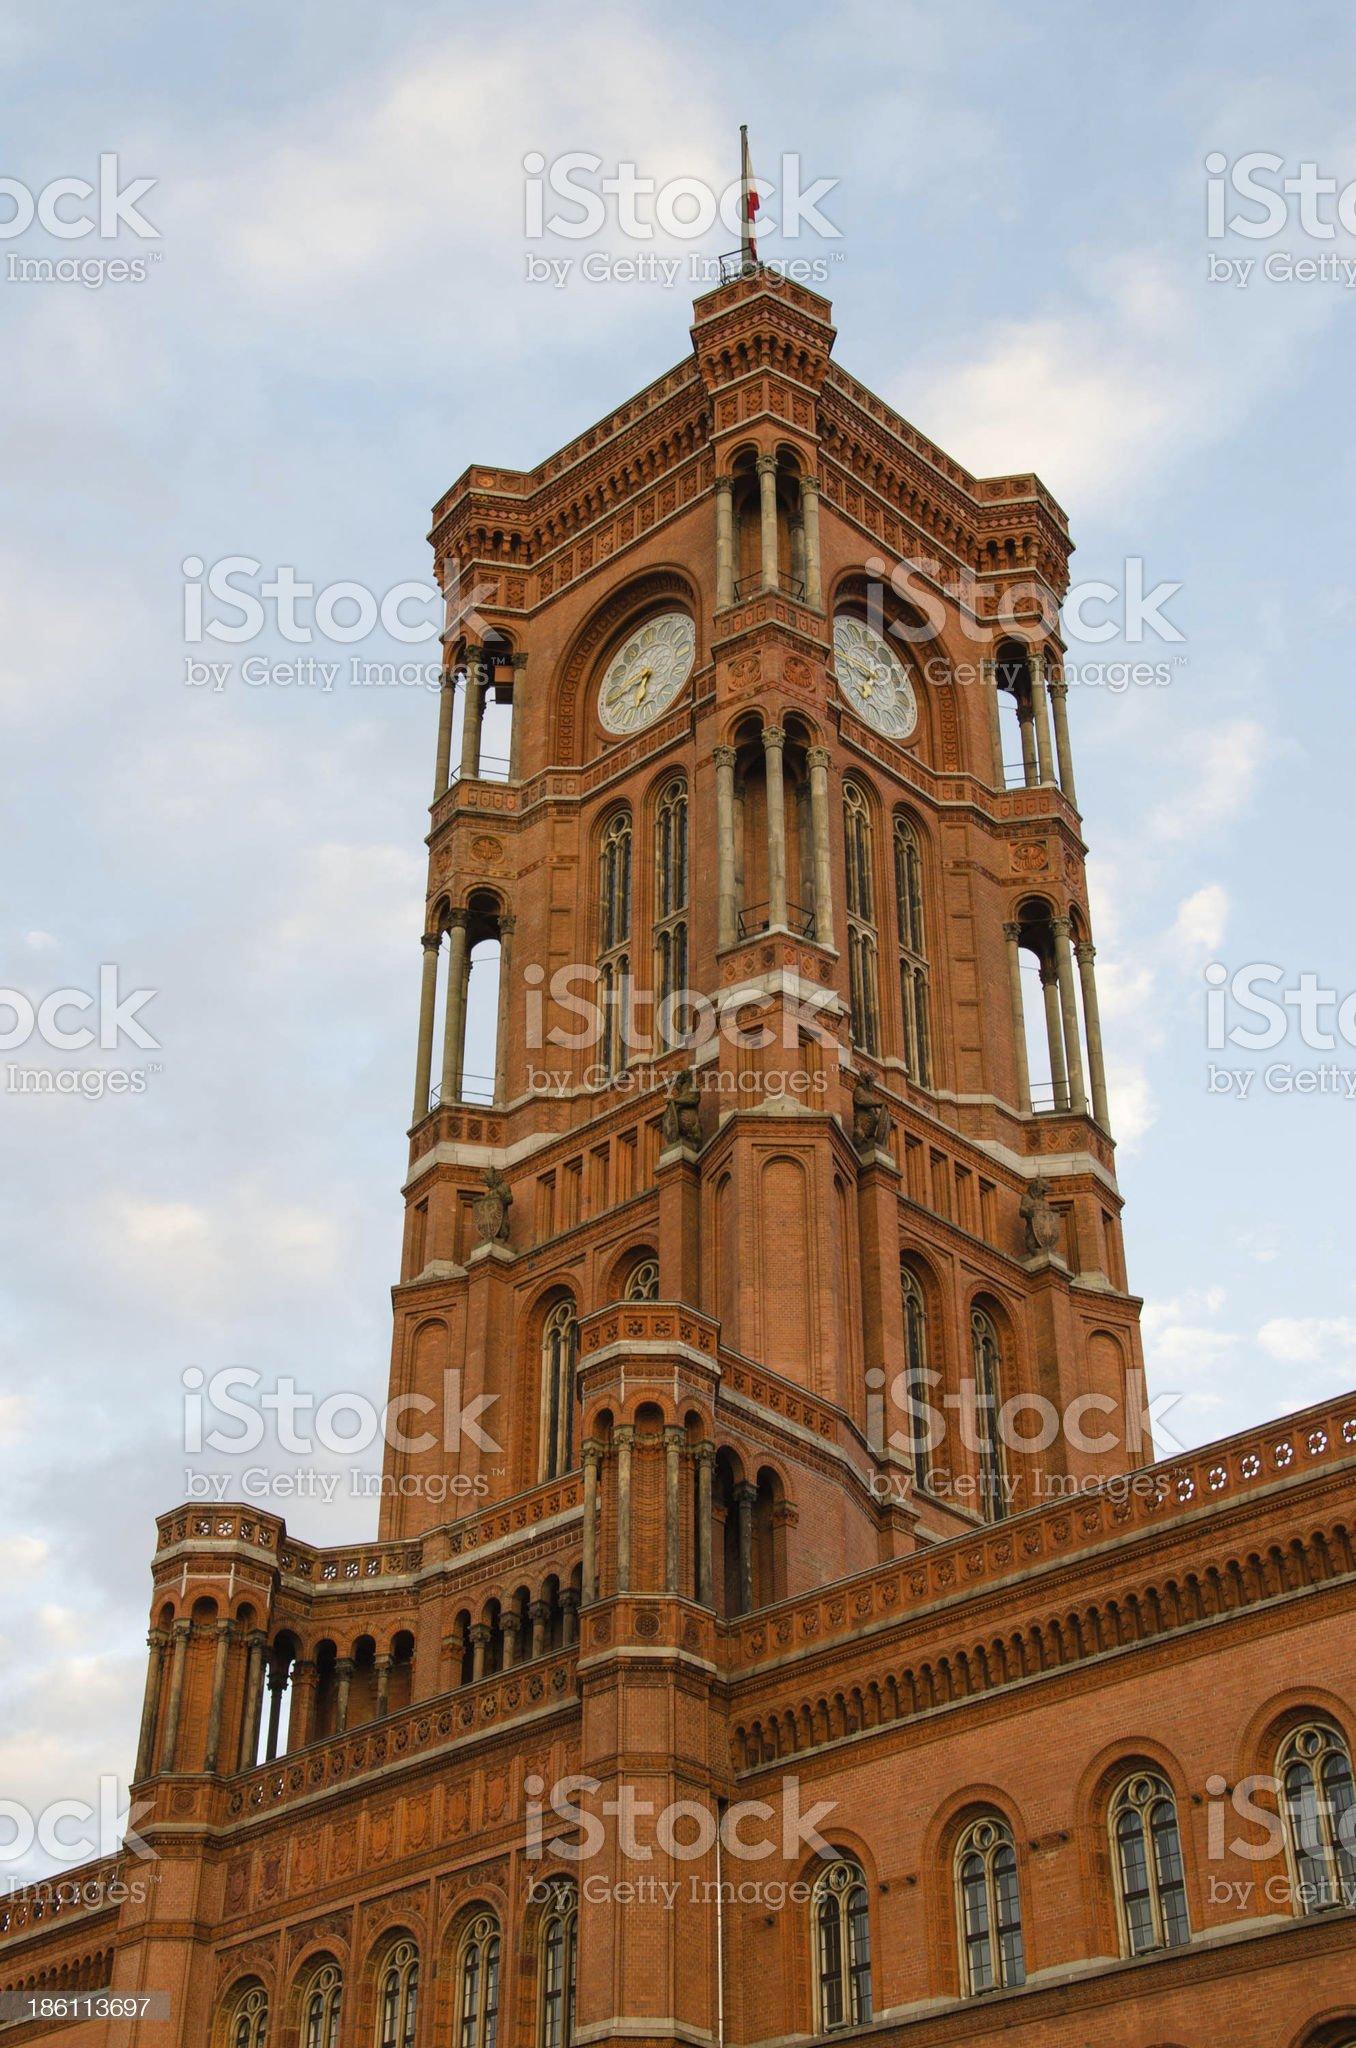 Berlin Town Hall (Rotes Rathaus) royalty-free stock photo